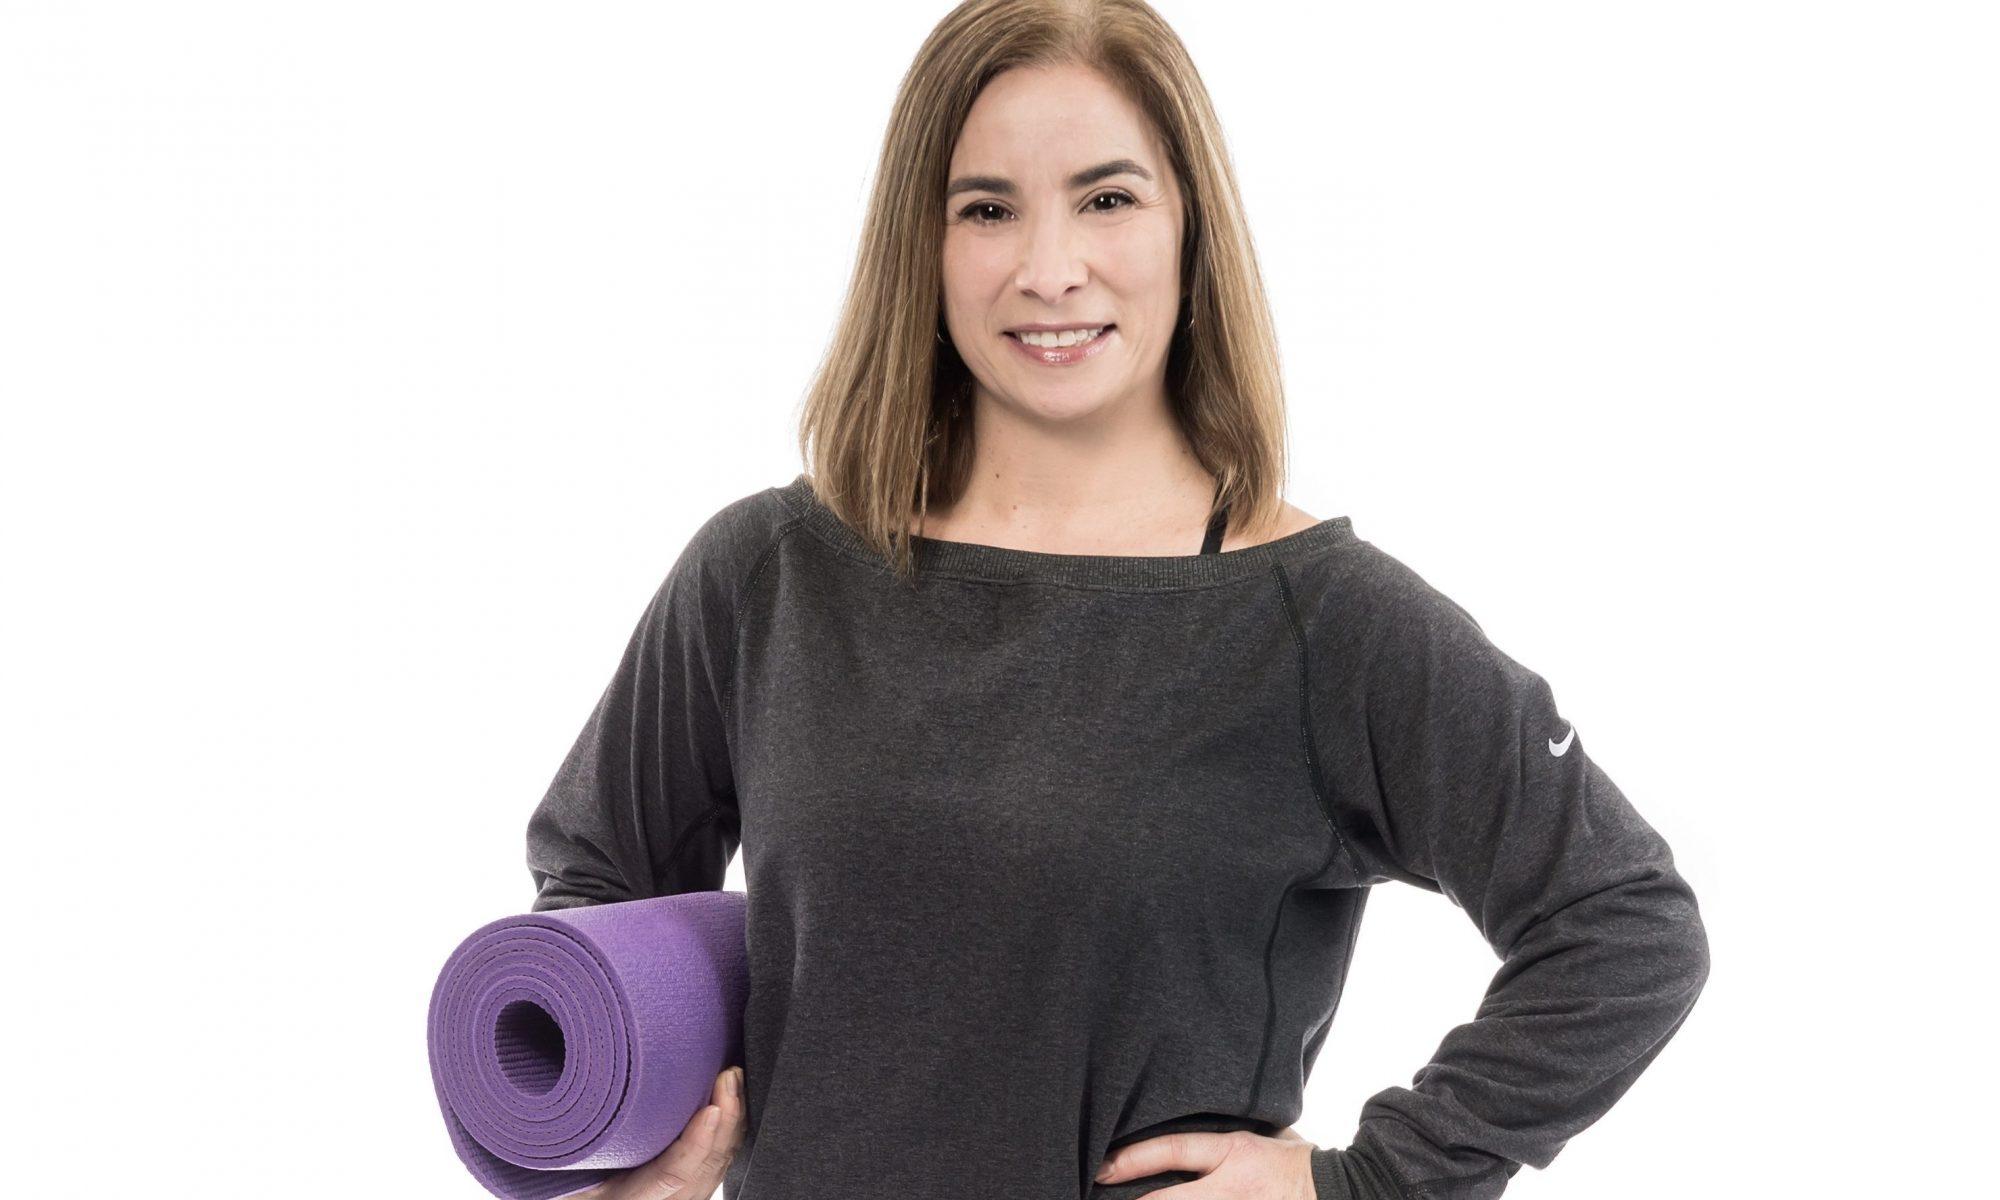 Nadia Vani : Née pour enseigner à bouger